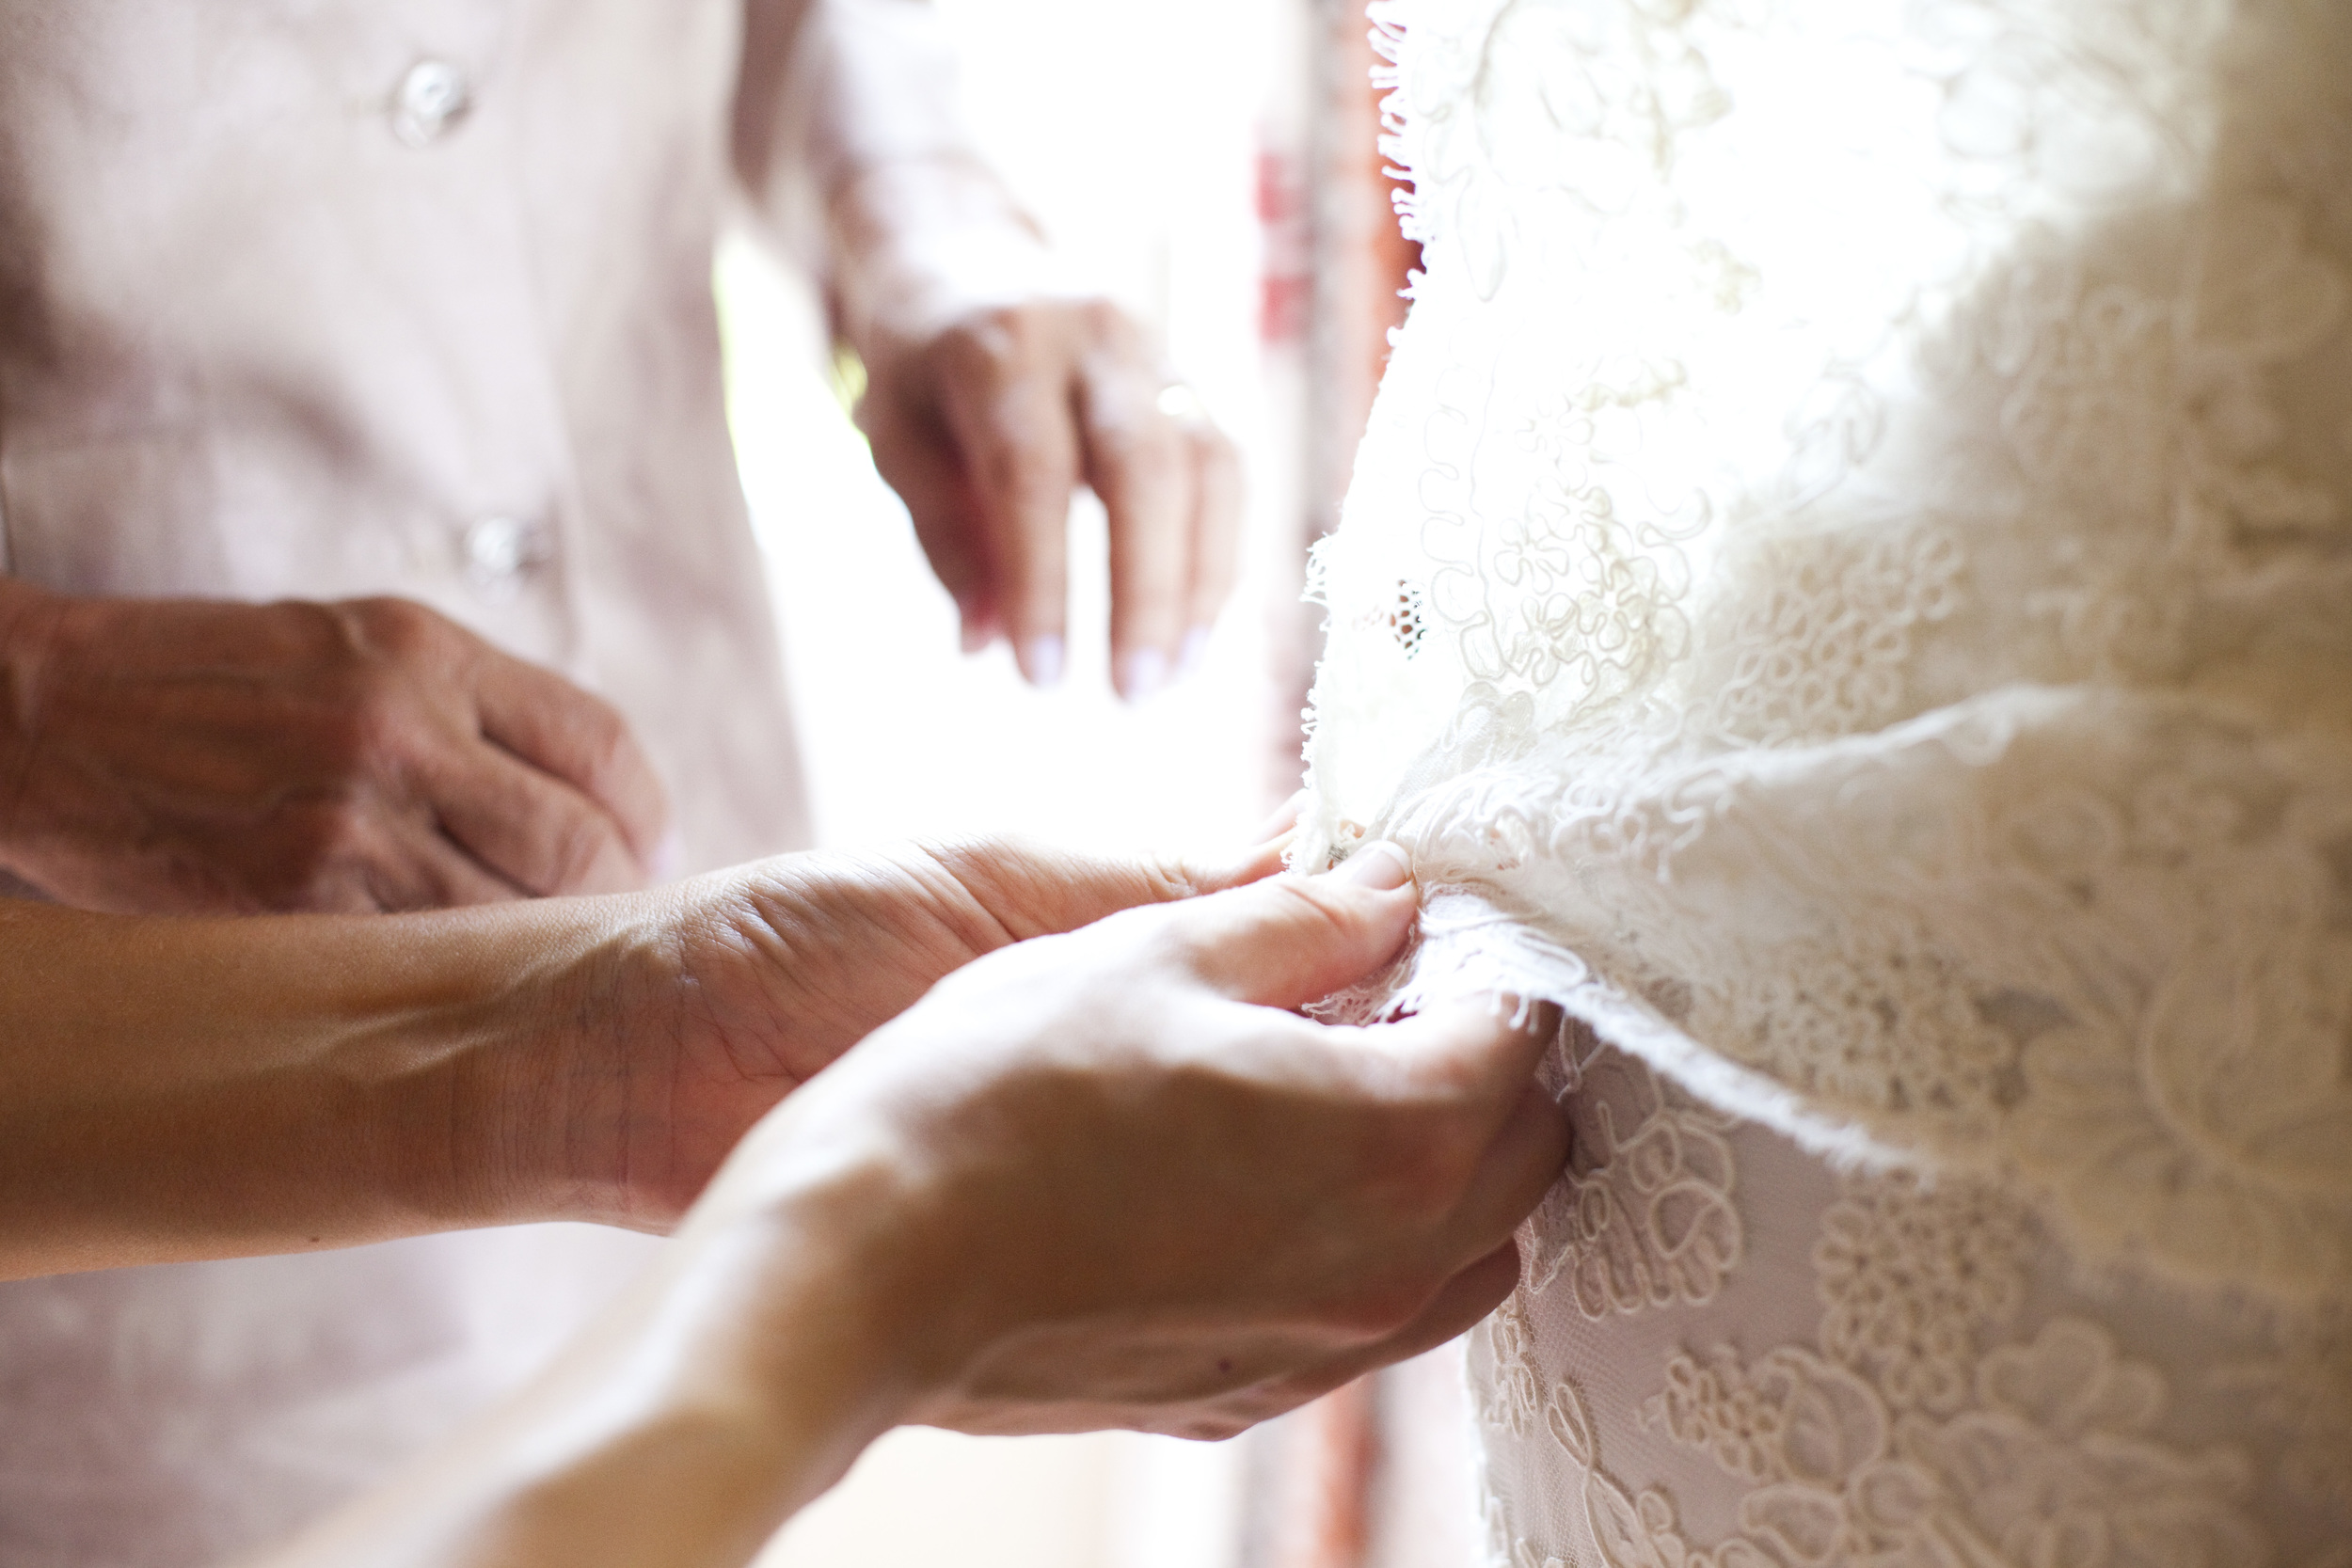 Ceci_New_York_Style_Luxury_Custom_Mexico_Wedding_CeciBride_Letterpress_NewYork_Foil_Hacienda_de_San_Antonio_9.jpg